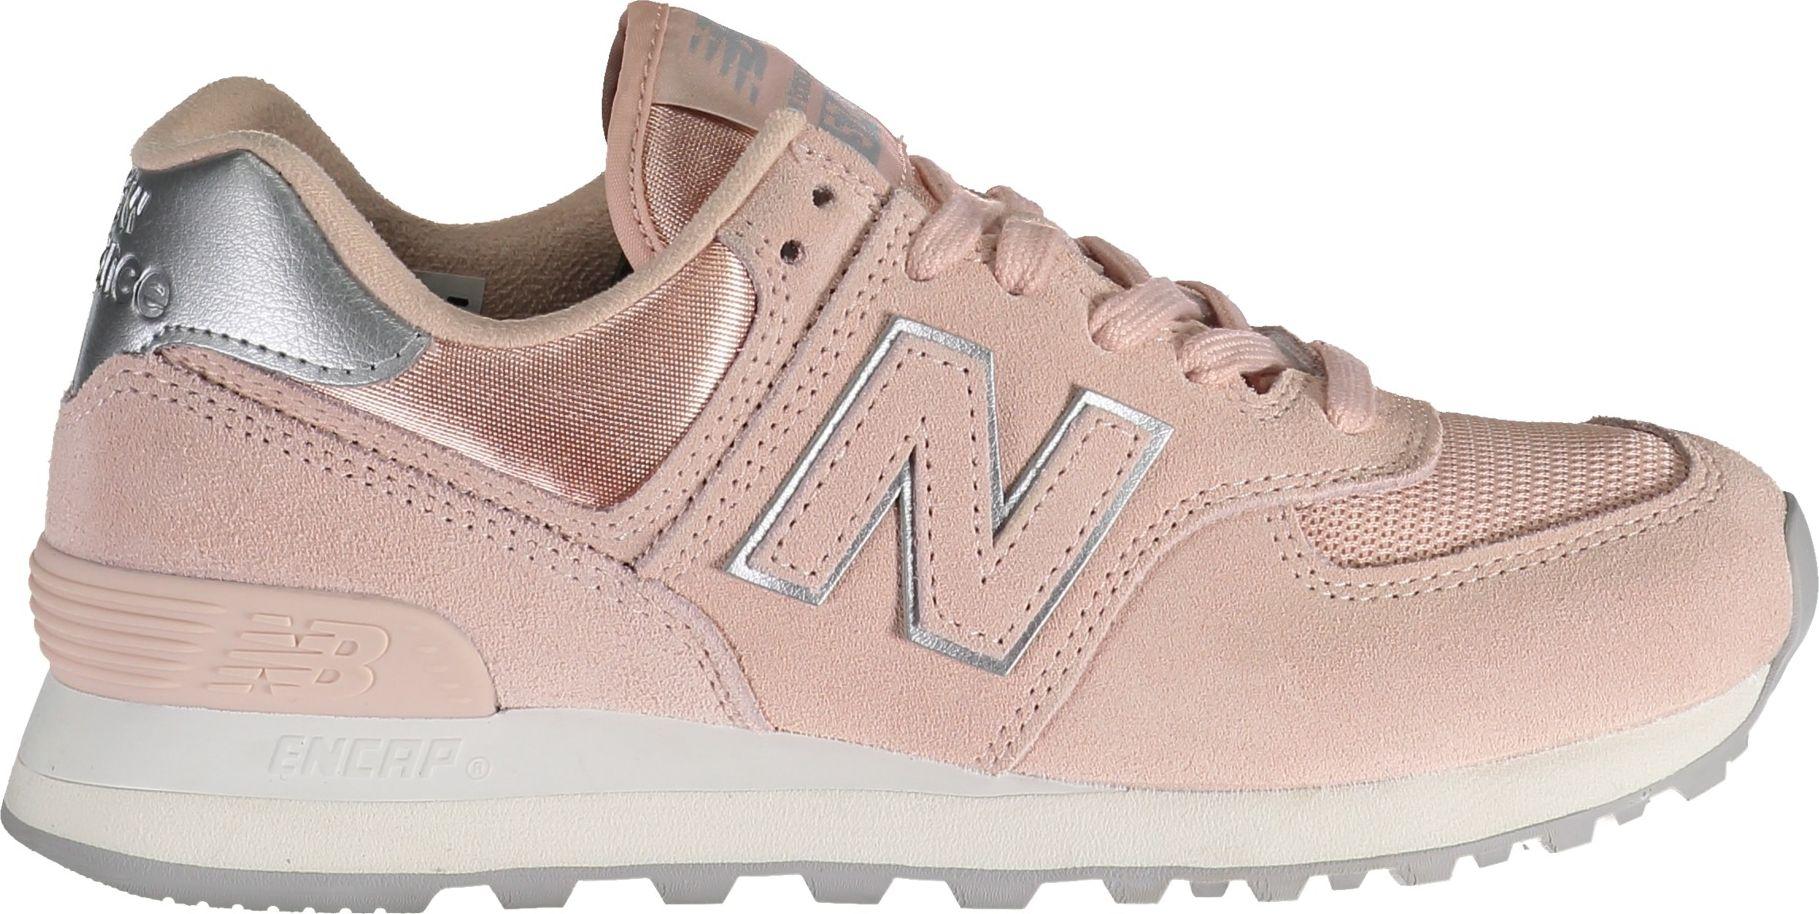 New Balance WL574 Oyster Pink 37